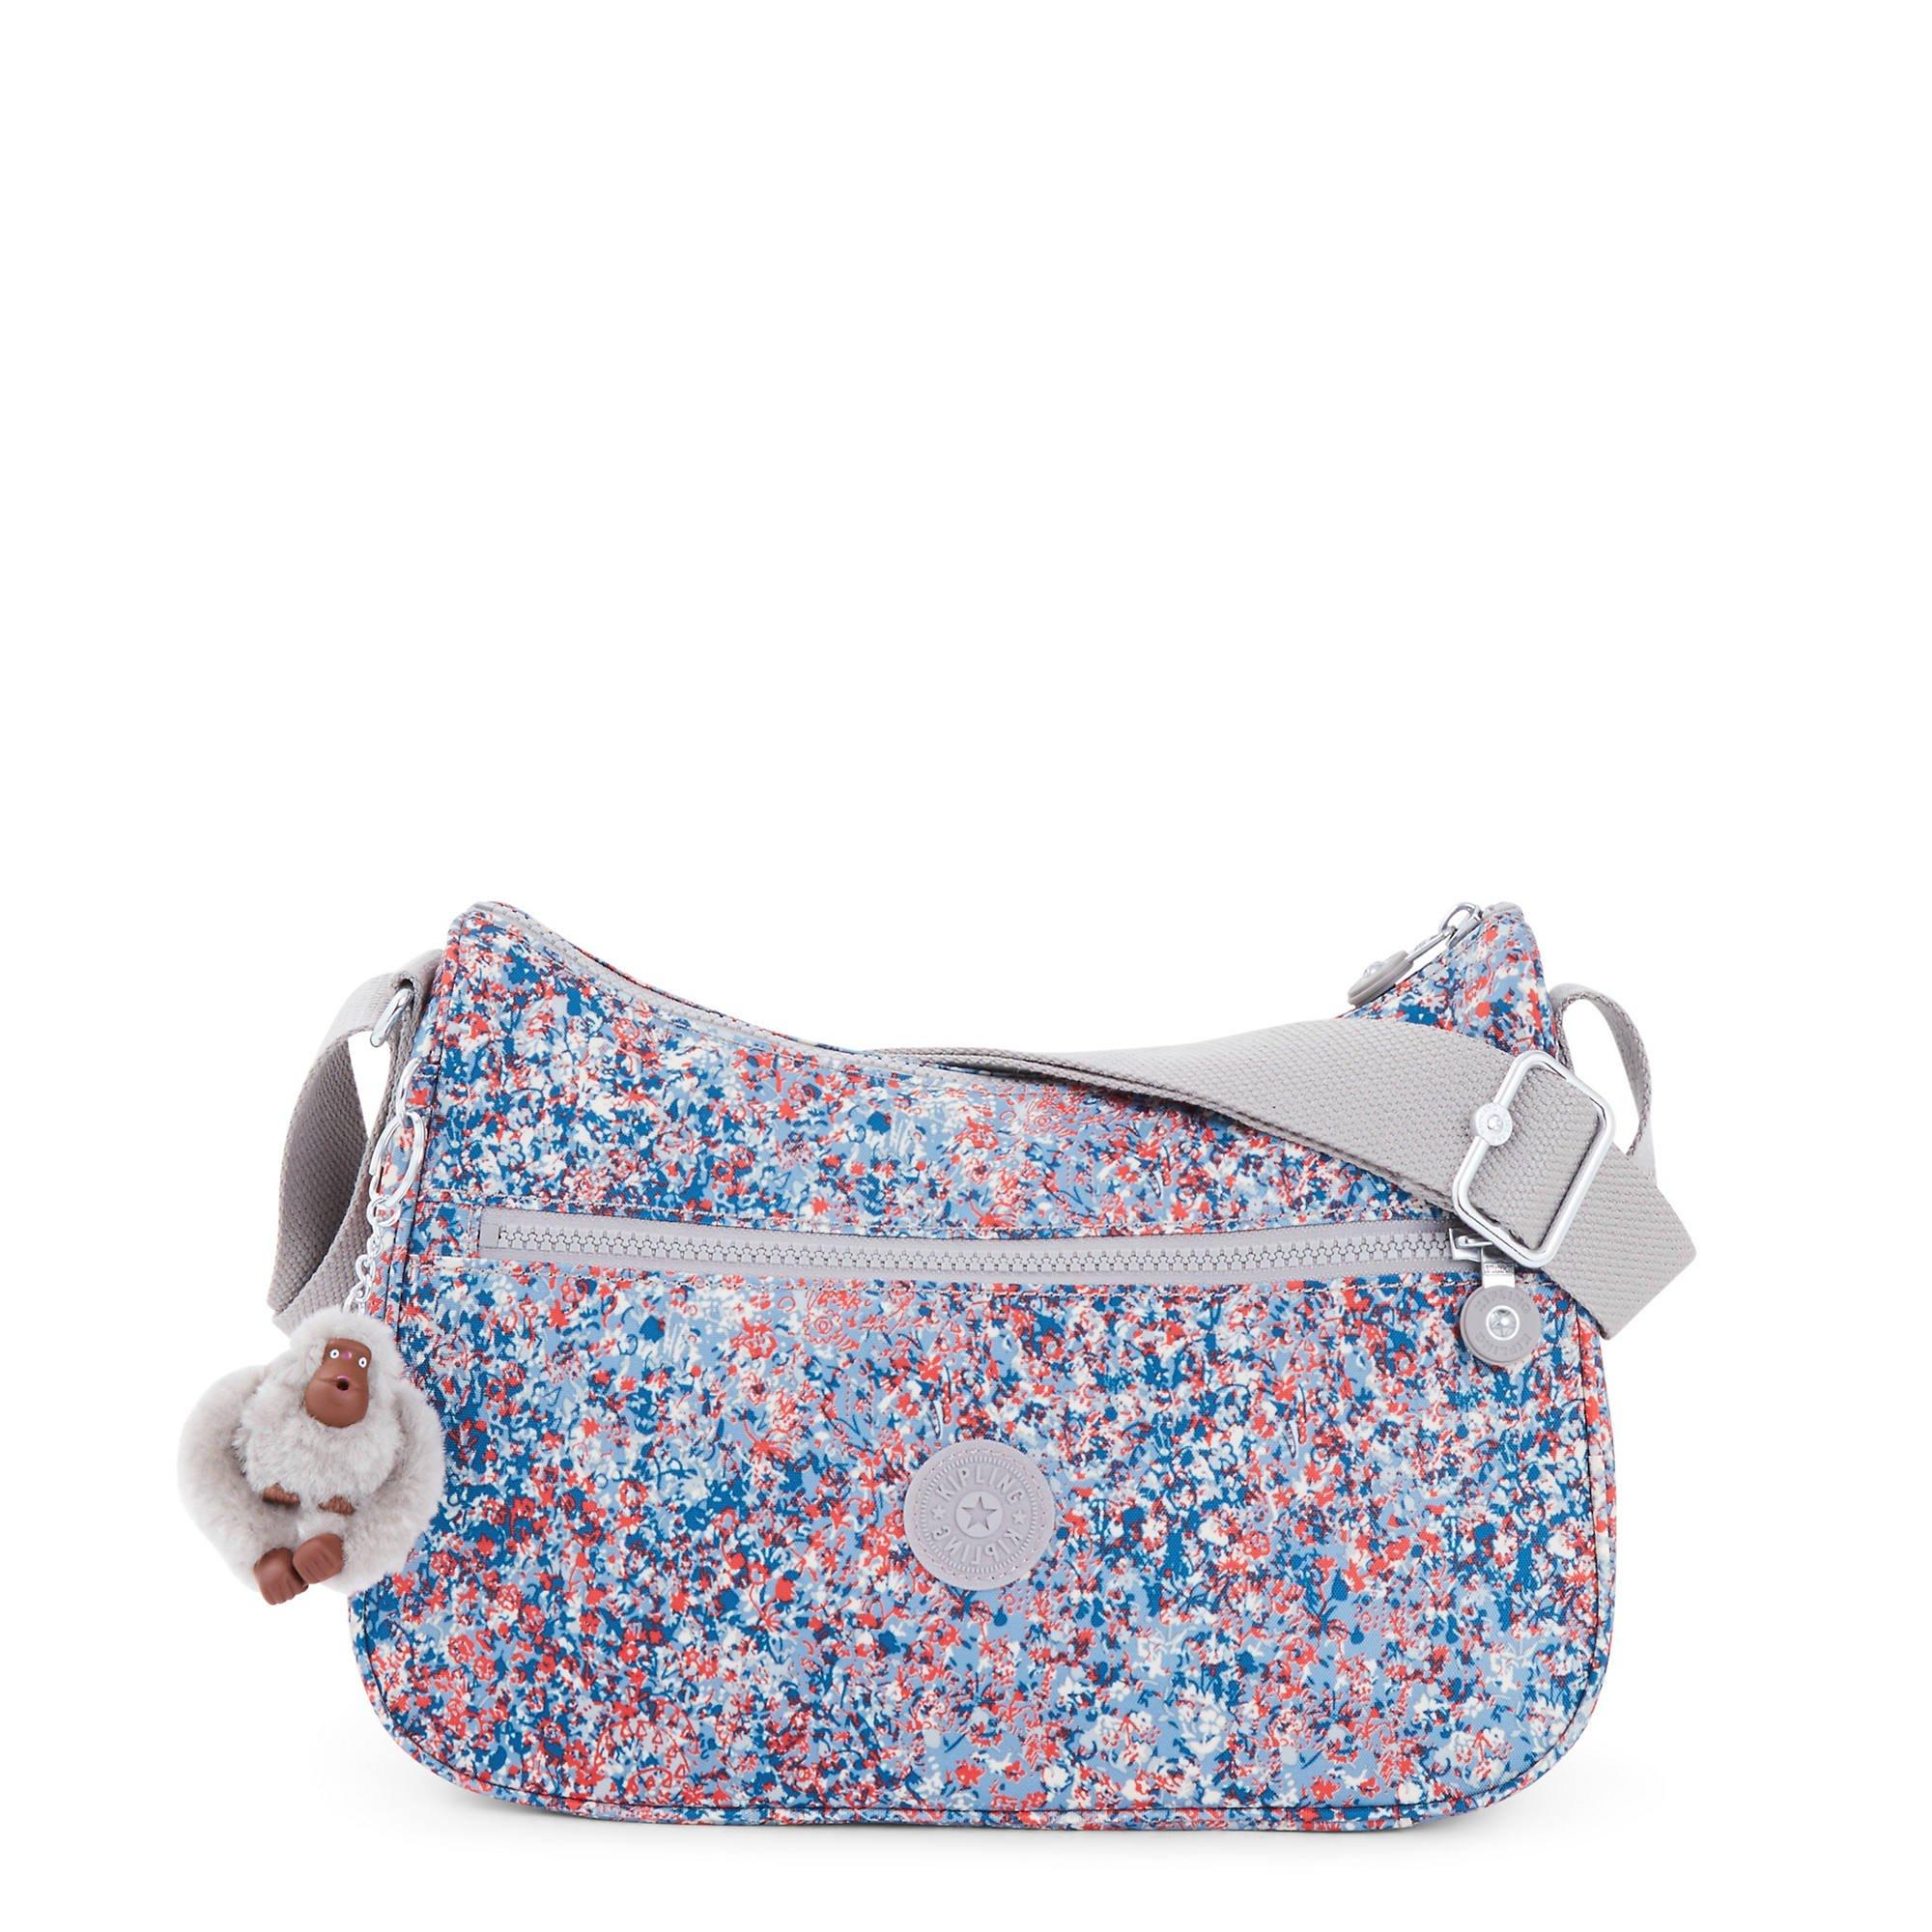 Kipling Women's Sally Printed Handbag One Size Fainted Floral